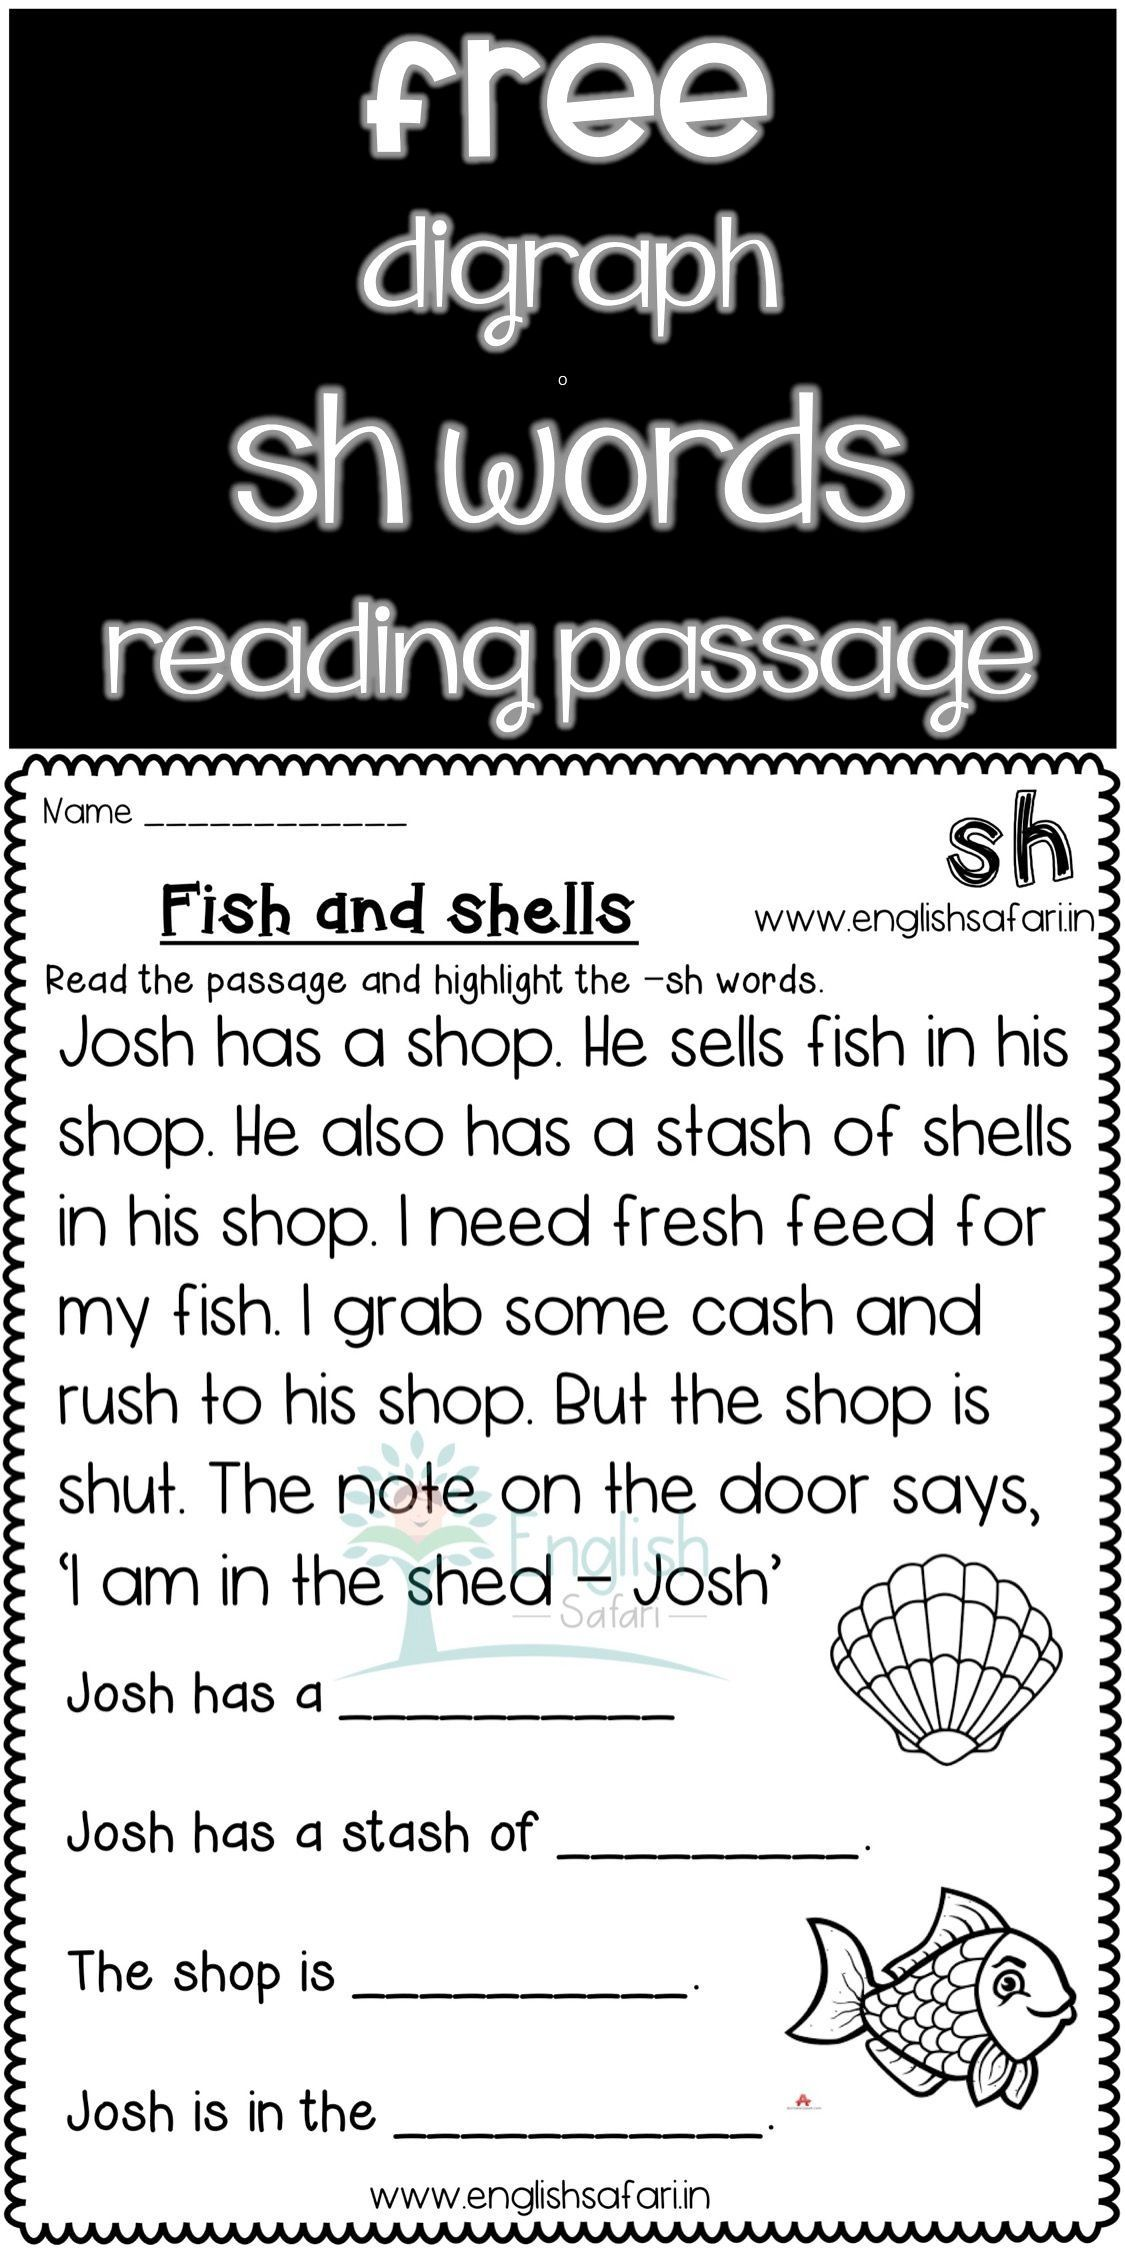 Free Sh Words Reading Comprehension Www Worksheetsenglish Com Reading Fluency Phonics Reading Passages Reading Comprehension Passages Free [ 2249 x 1125 Pixel ]